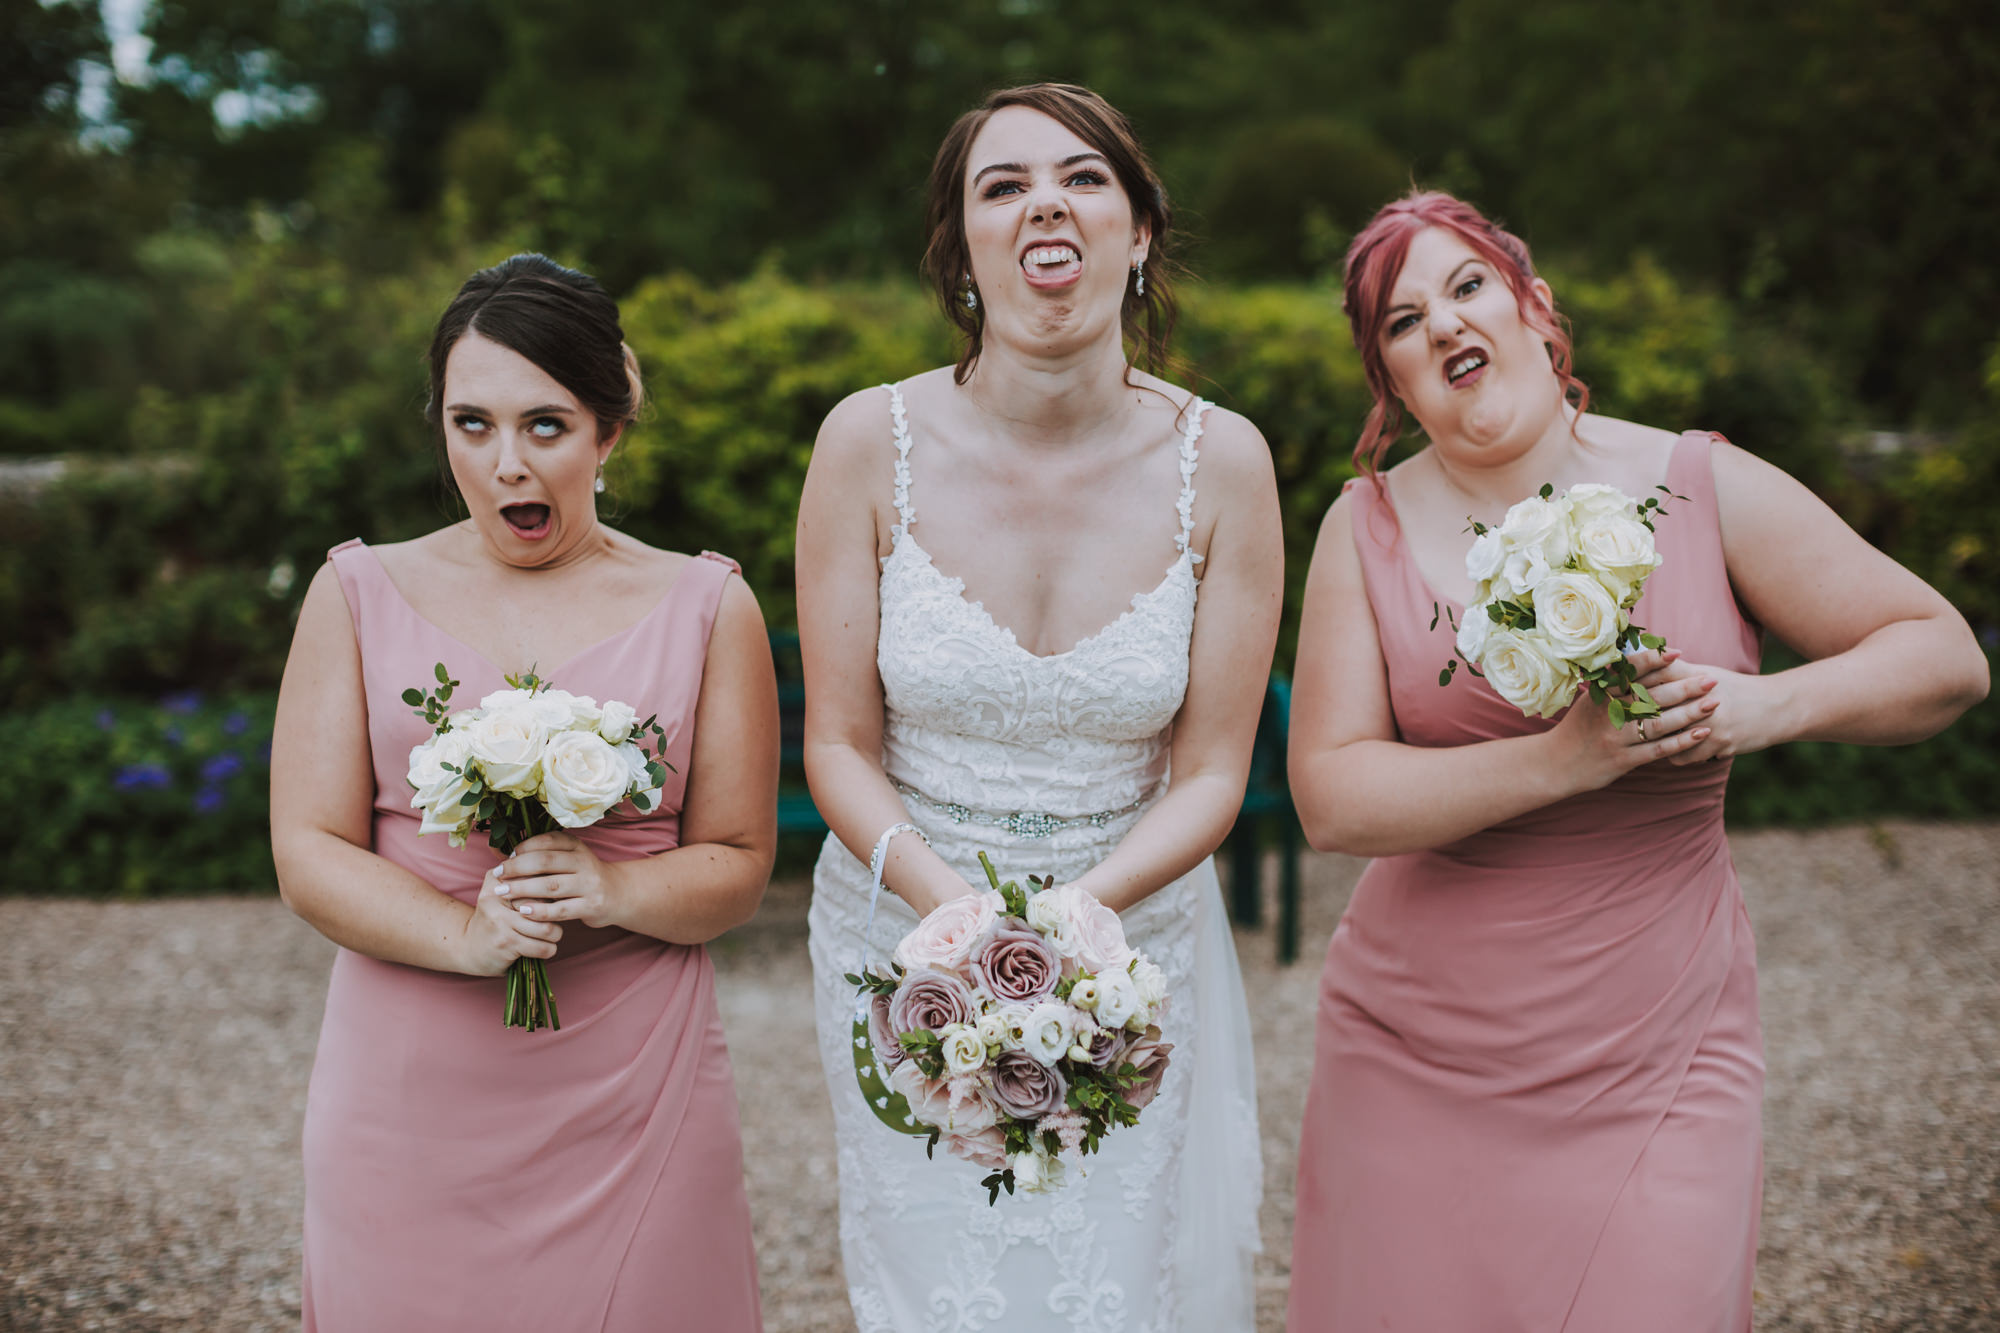 hodsock priory wedding photographers blog55.jpg